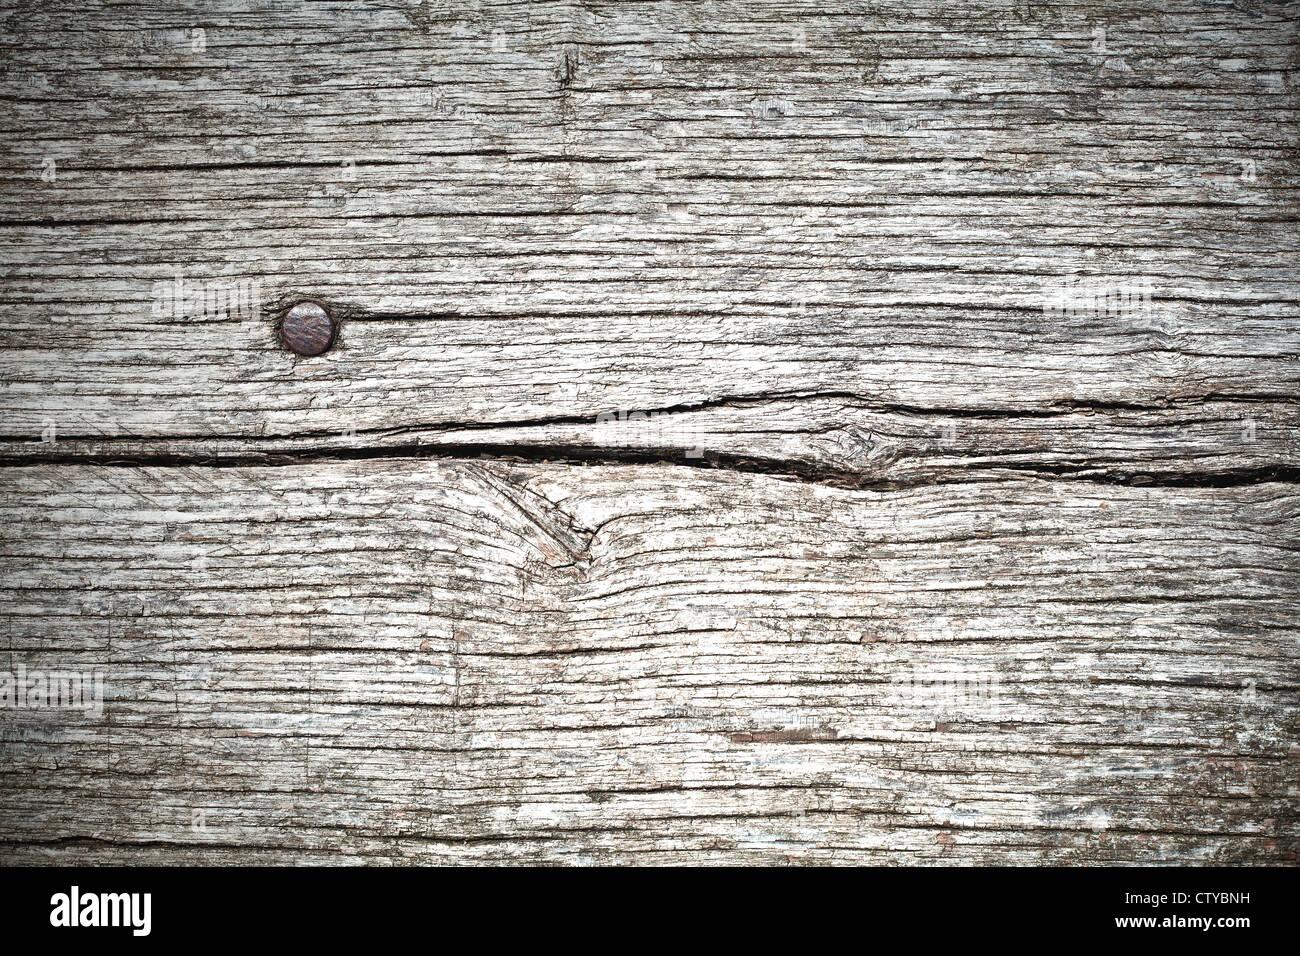 Wood Texture Stockfotos U0026 Wood Texture Bilder - Alamy